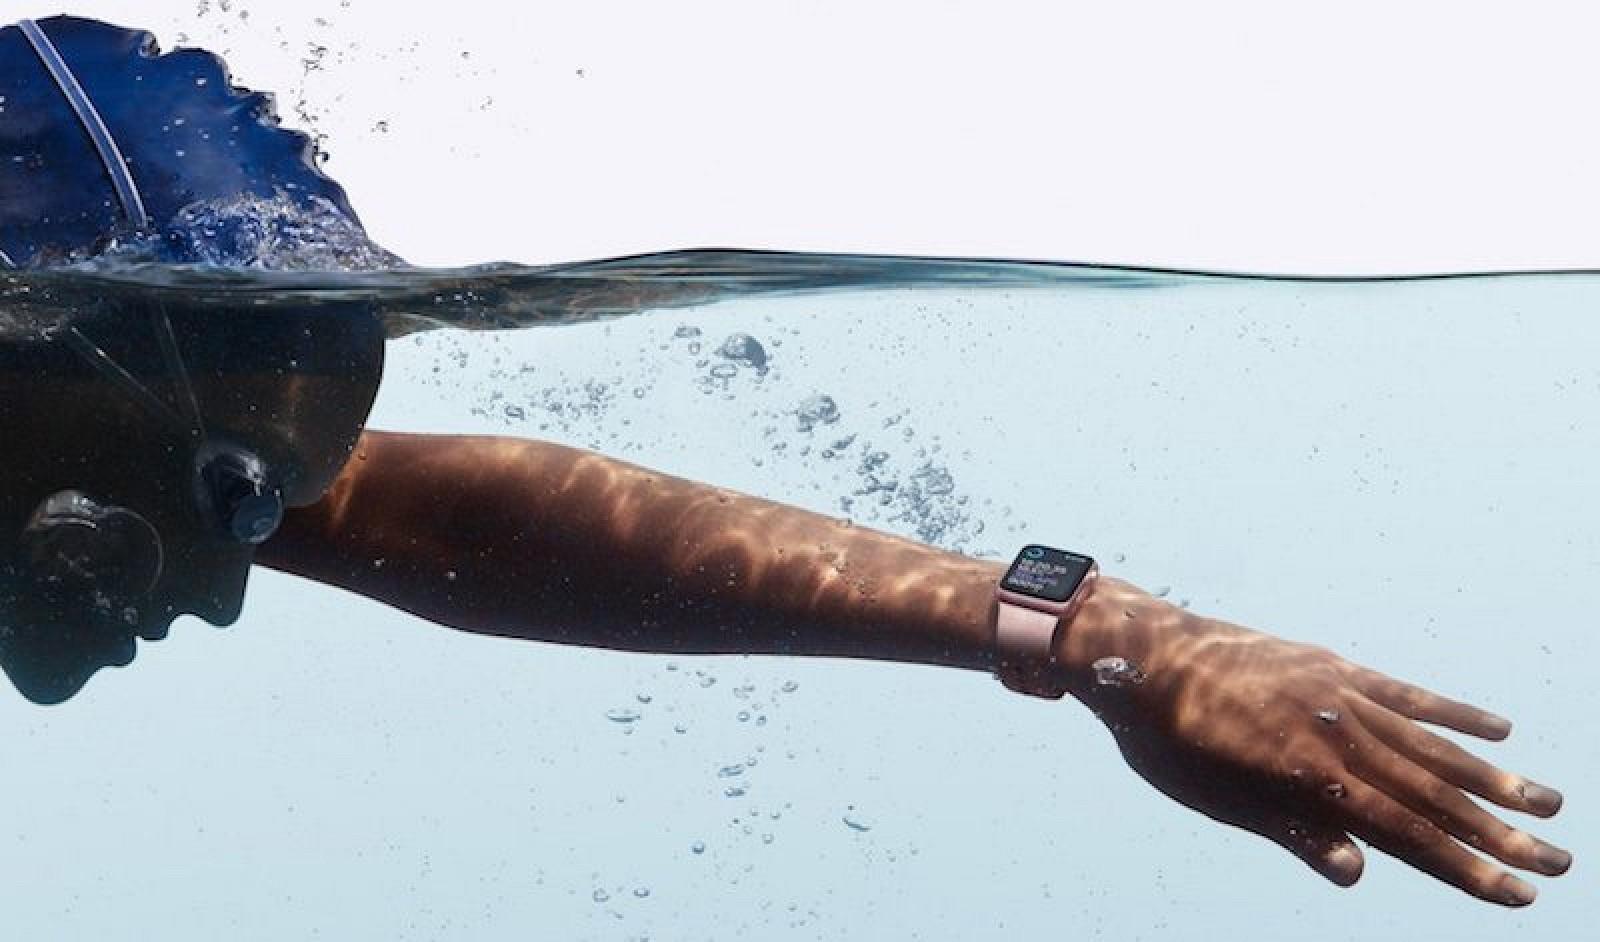 Apple Watch Series 2 Water Proof Ip67 wallpapers